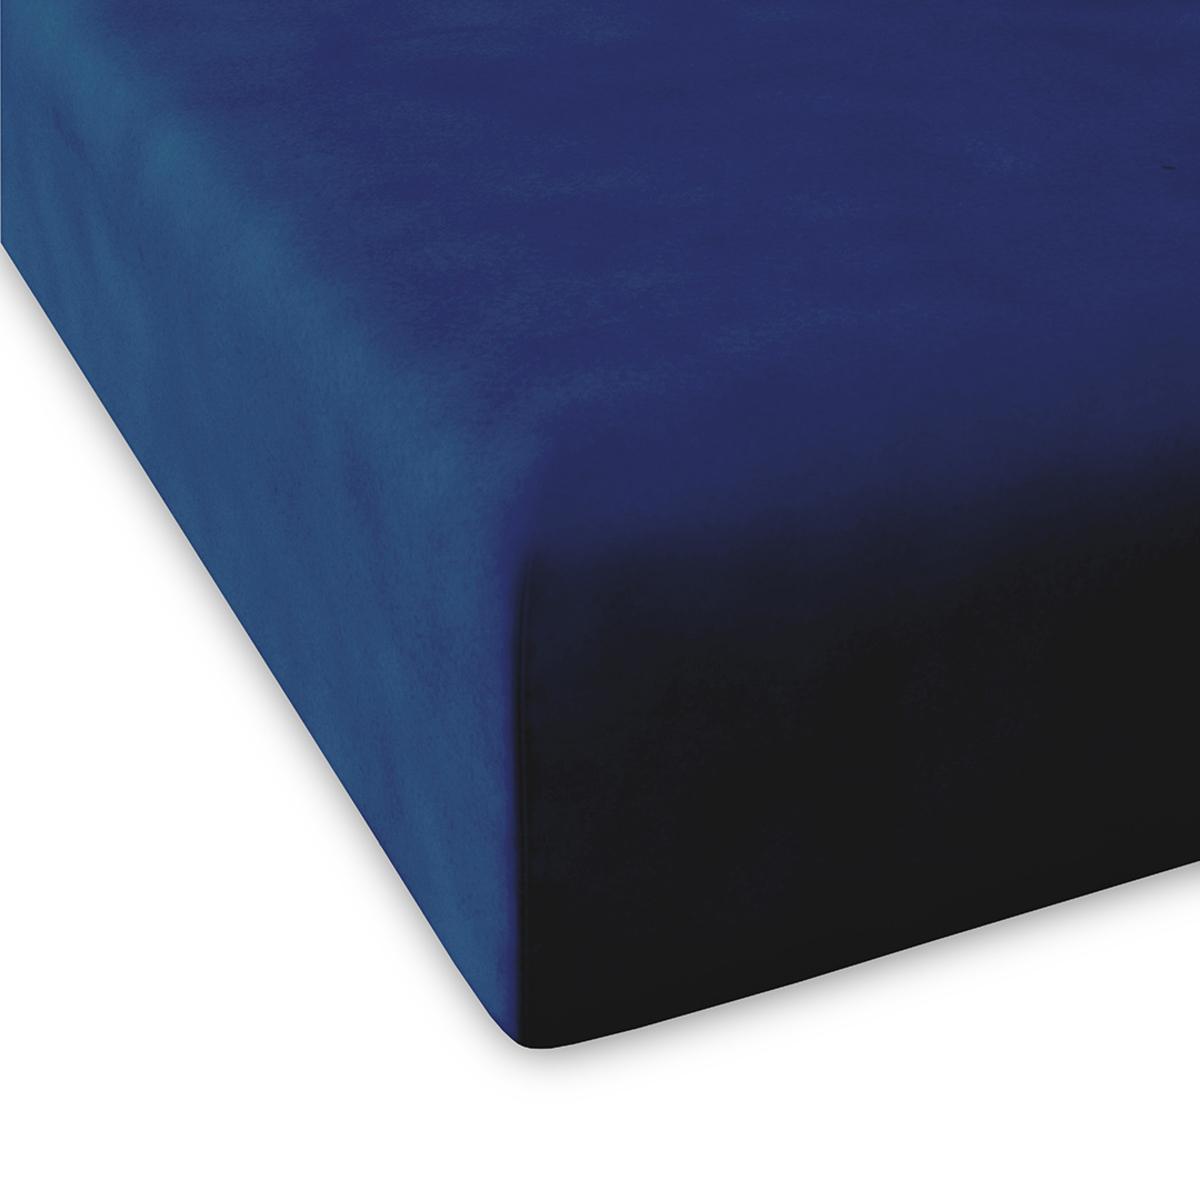 Drap housse en coton bleu marine 90x200